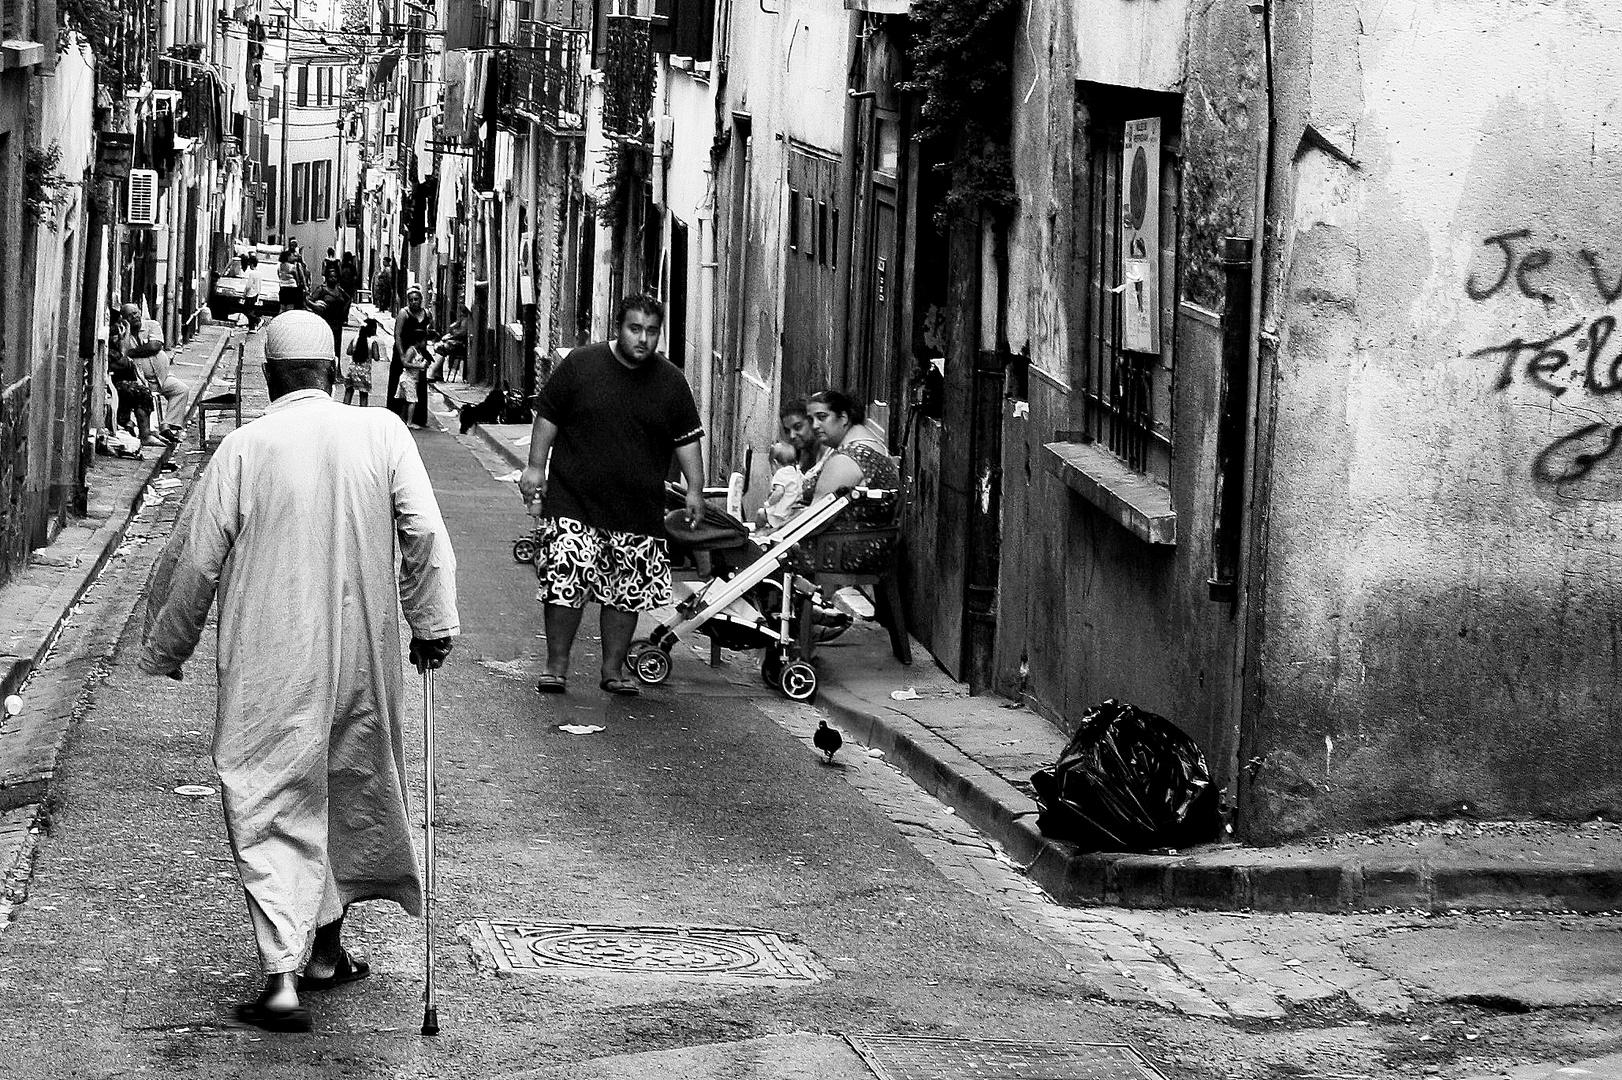 Quartier St Jacques Perpignan